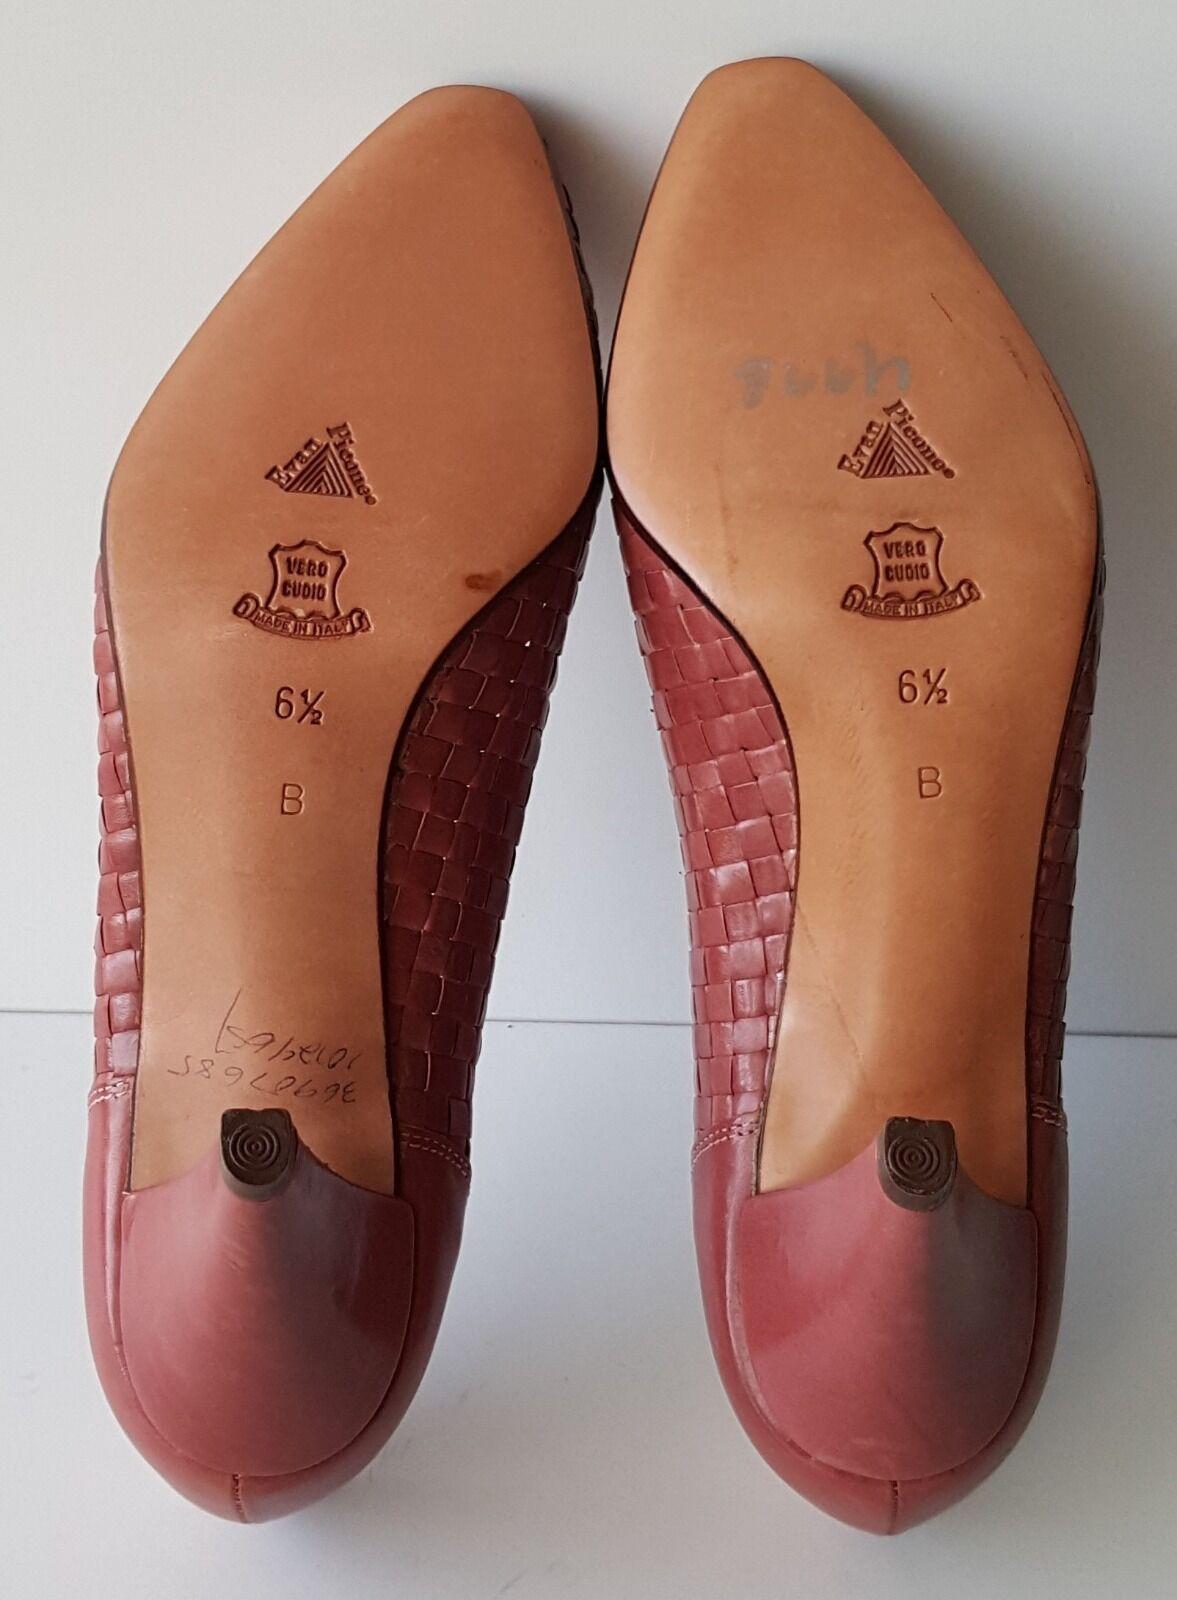 Evan Picone High 6 Heels Schuhes Made in  Größe 6 High 1/2 B 6c7d73